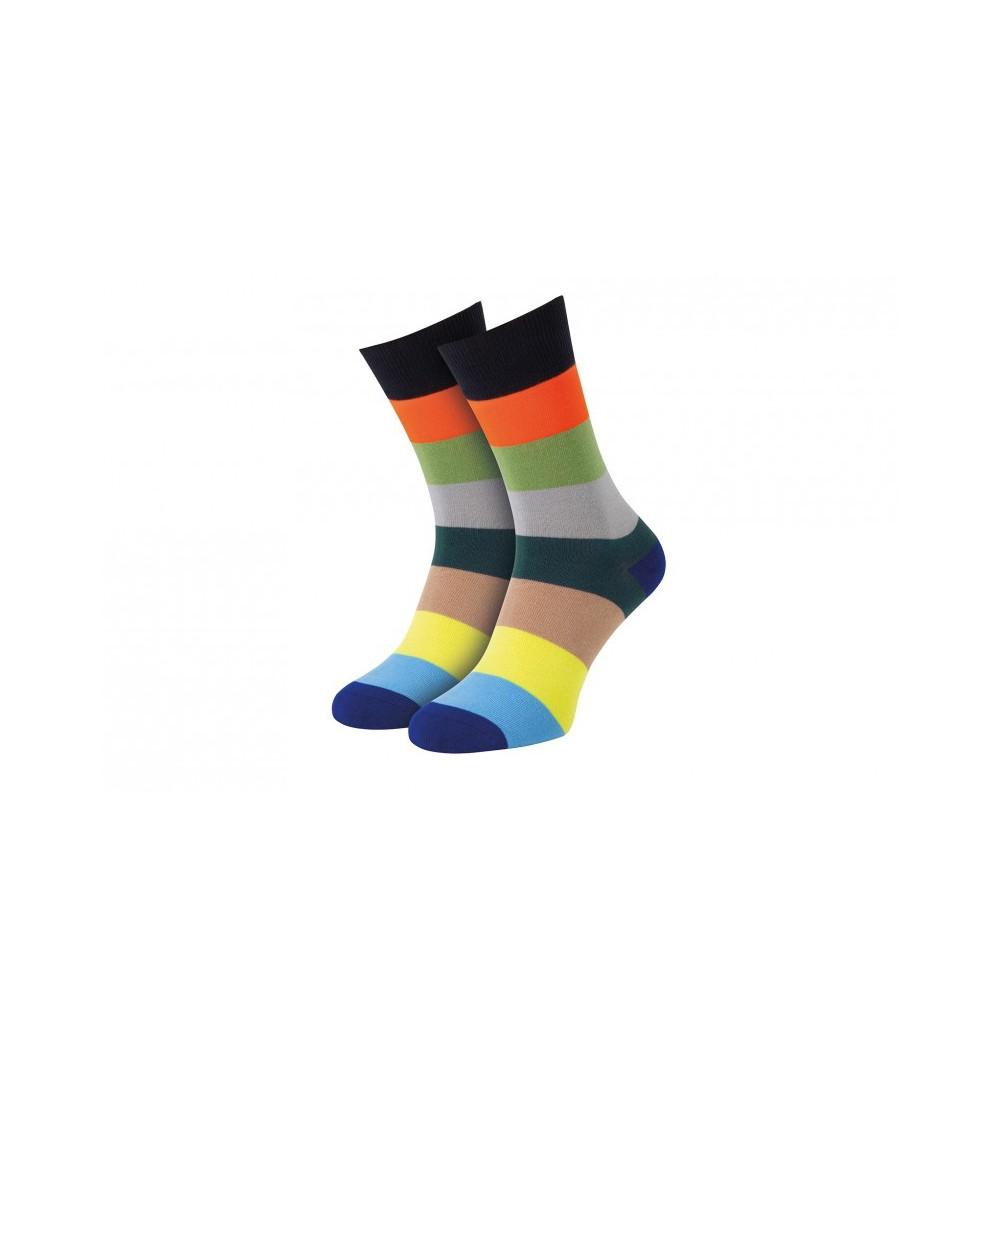 Socken Modell 38 von REMEMBER